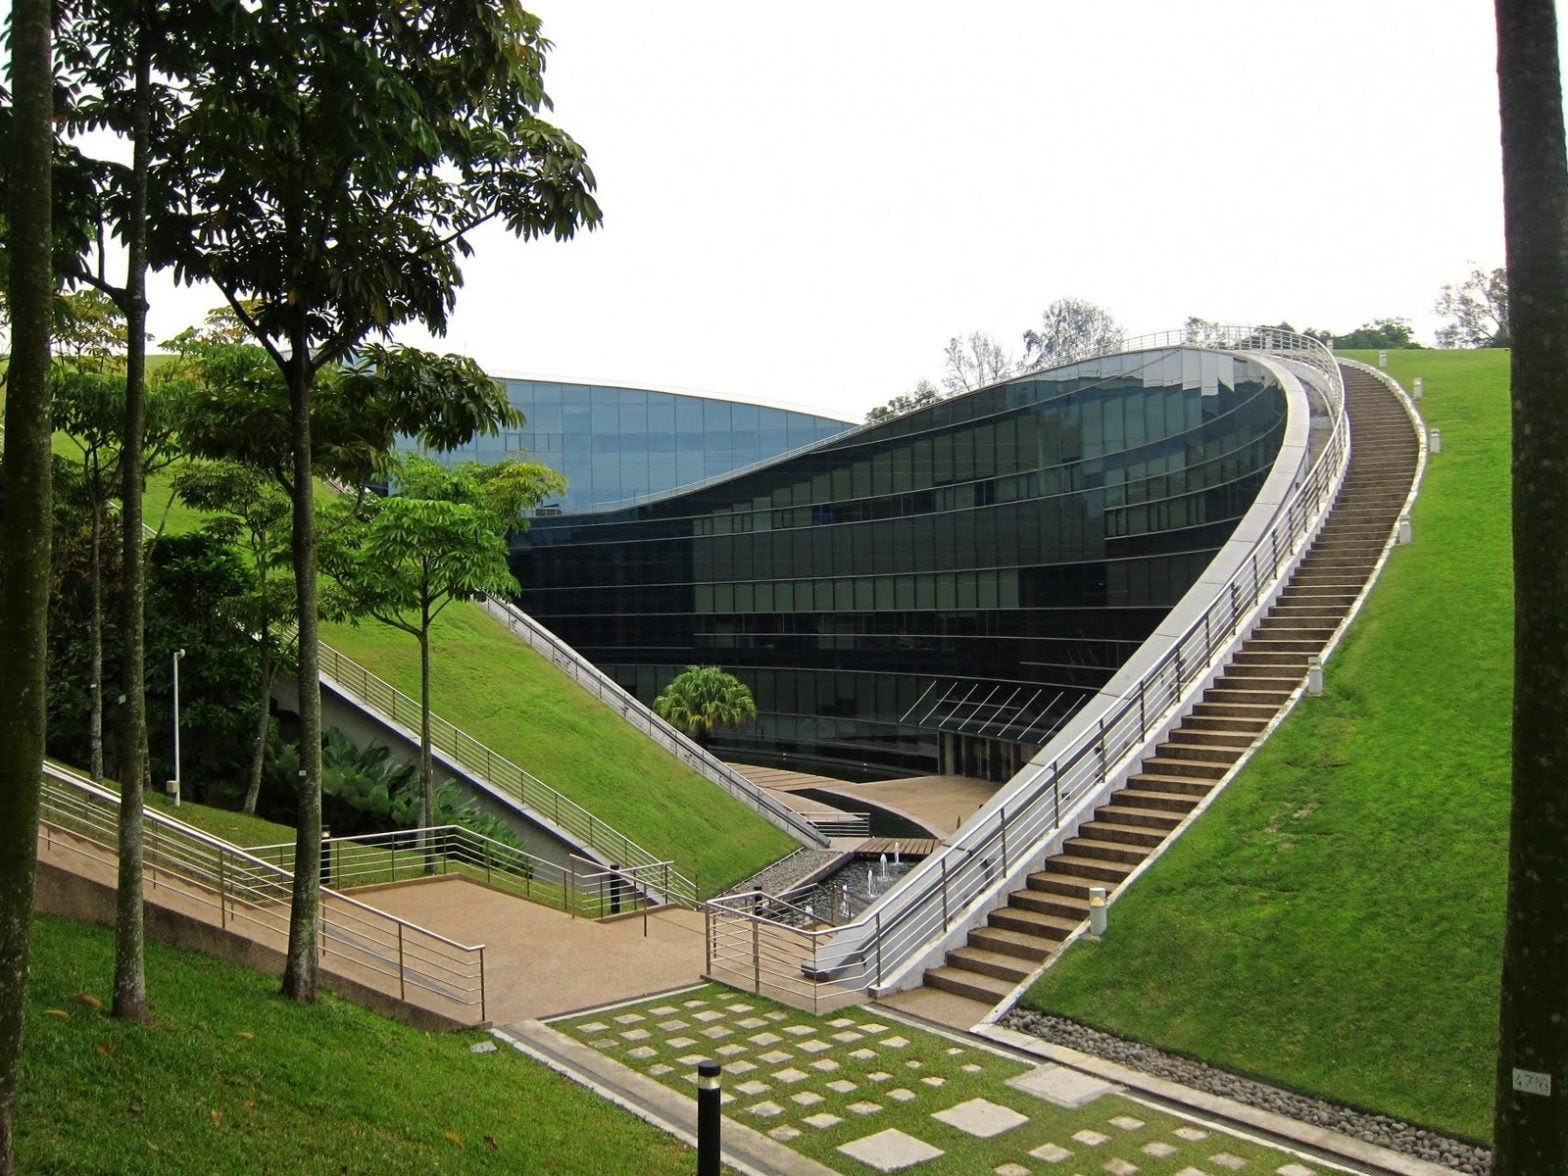 Nan yang Technological university (NTU)